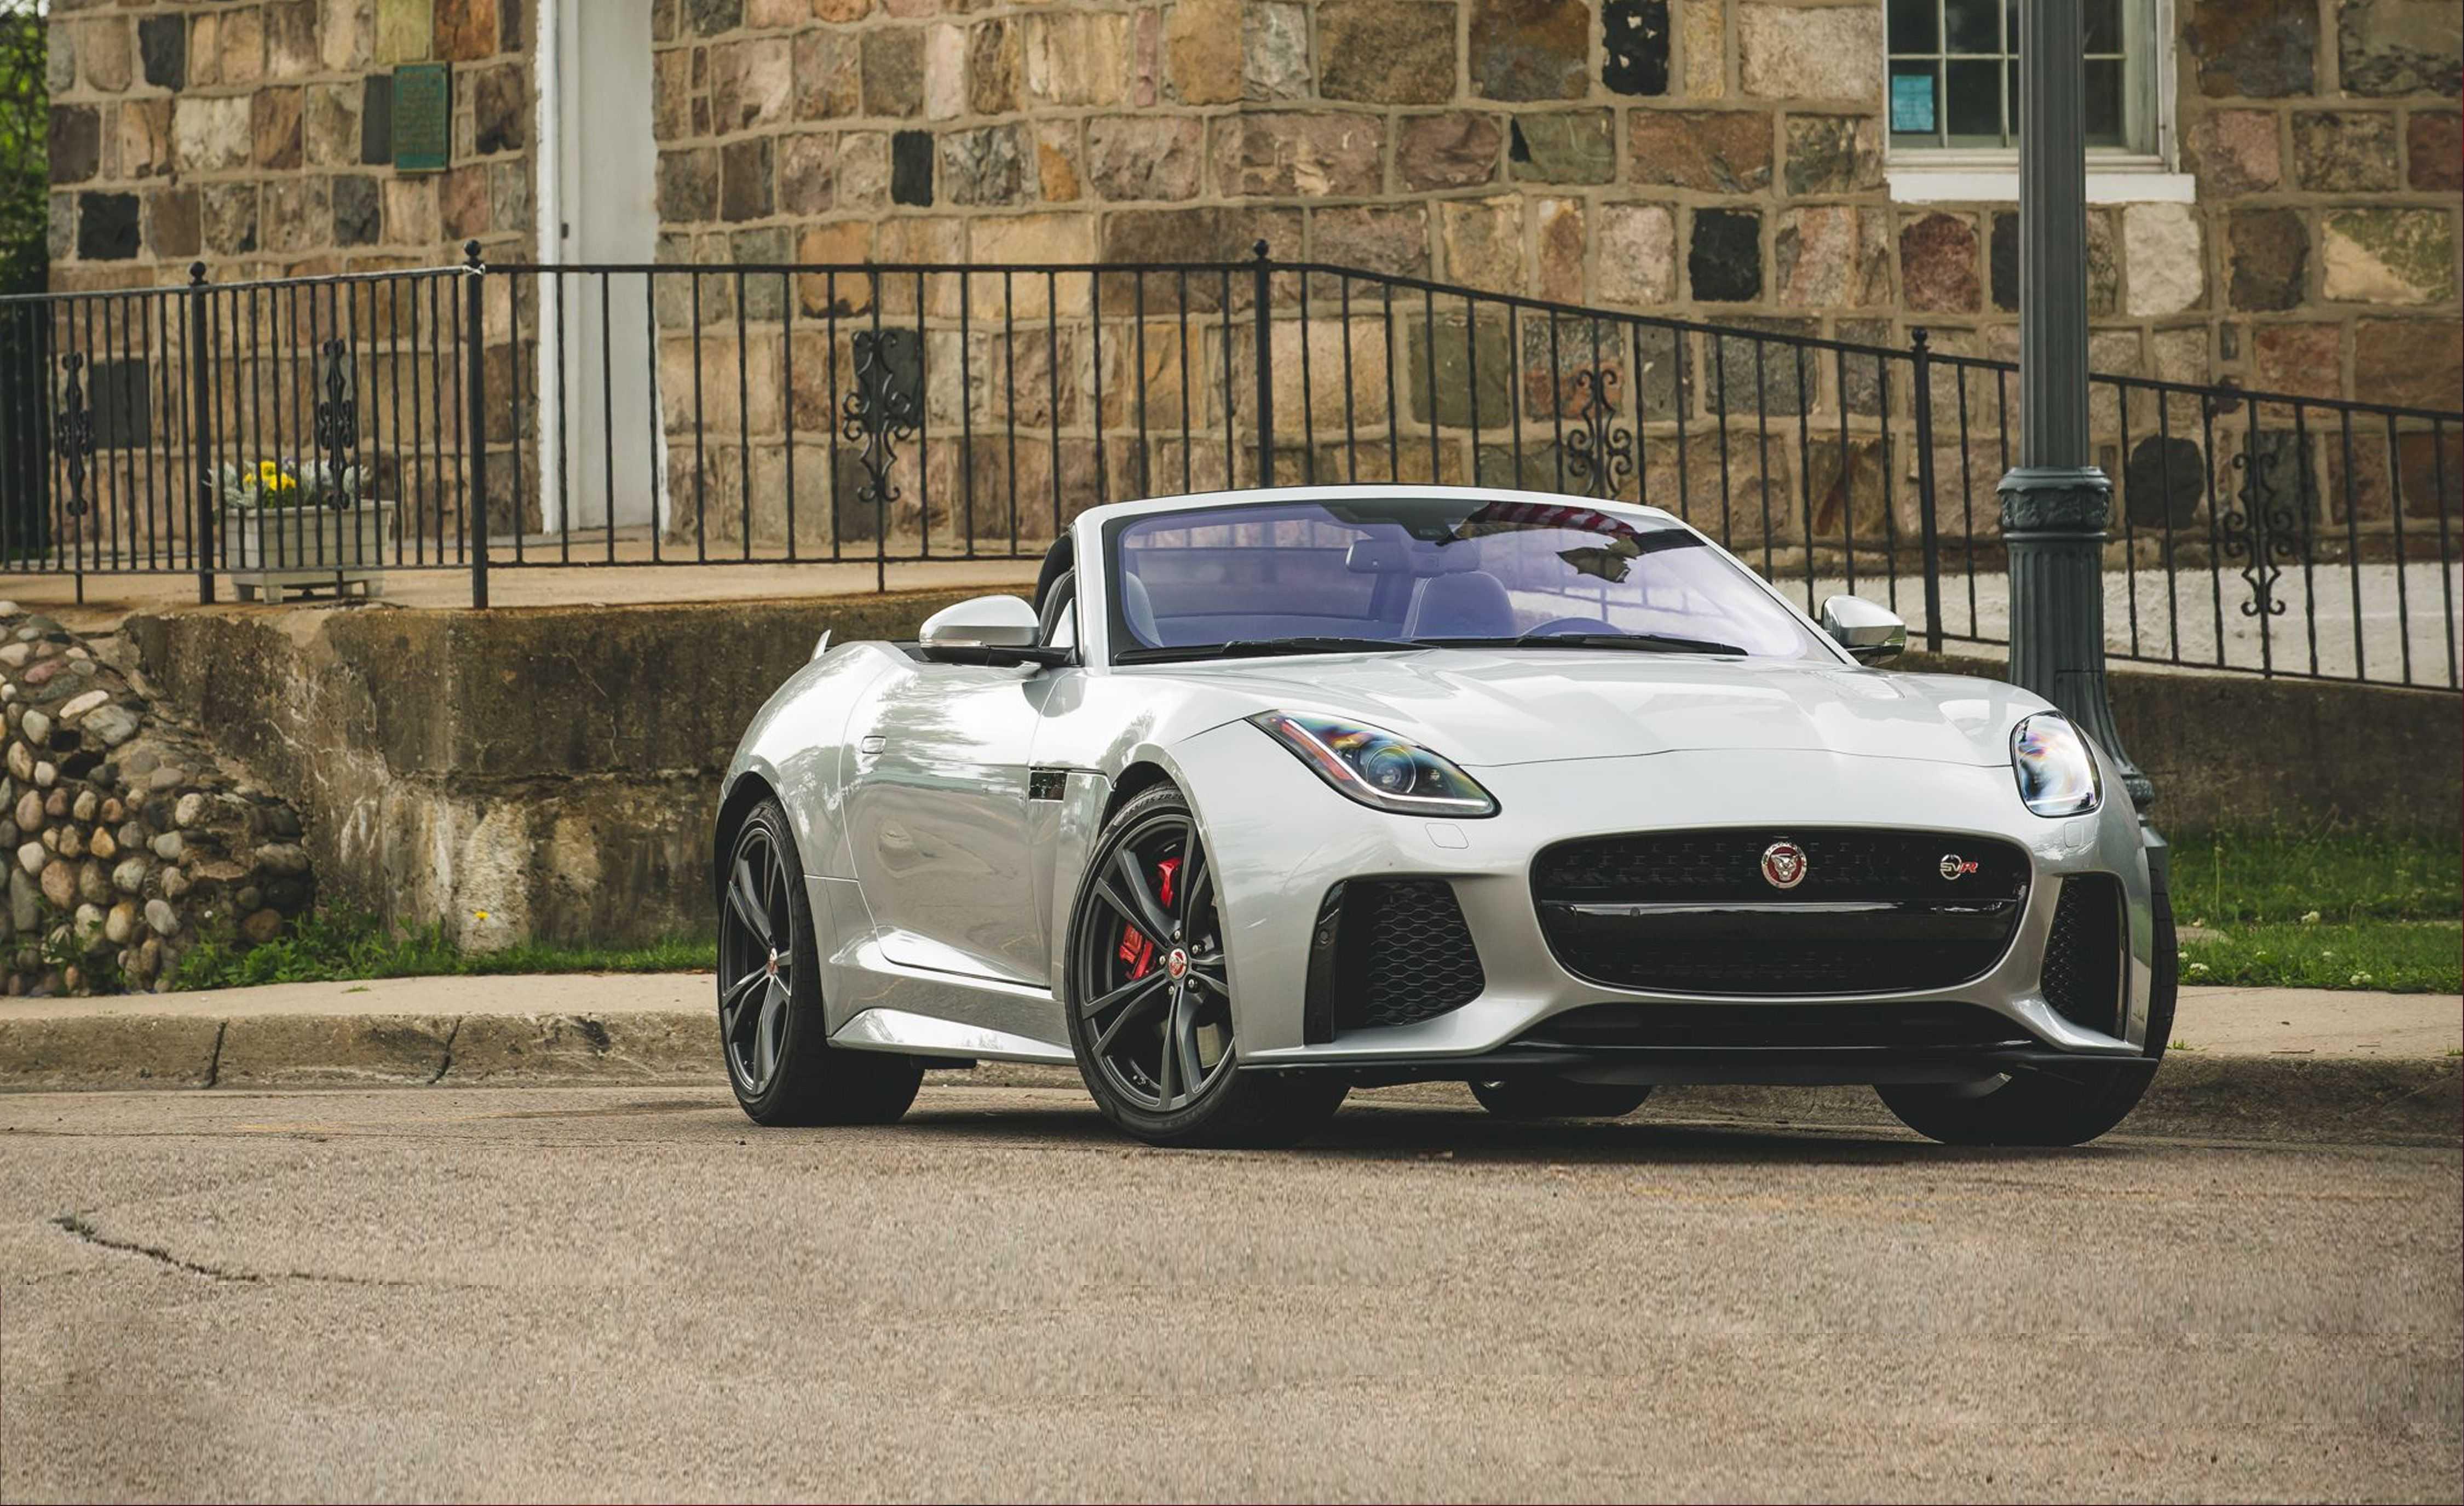 Тест драйв jaguar f-type - исповедь грешника